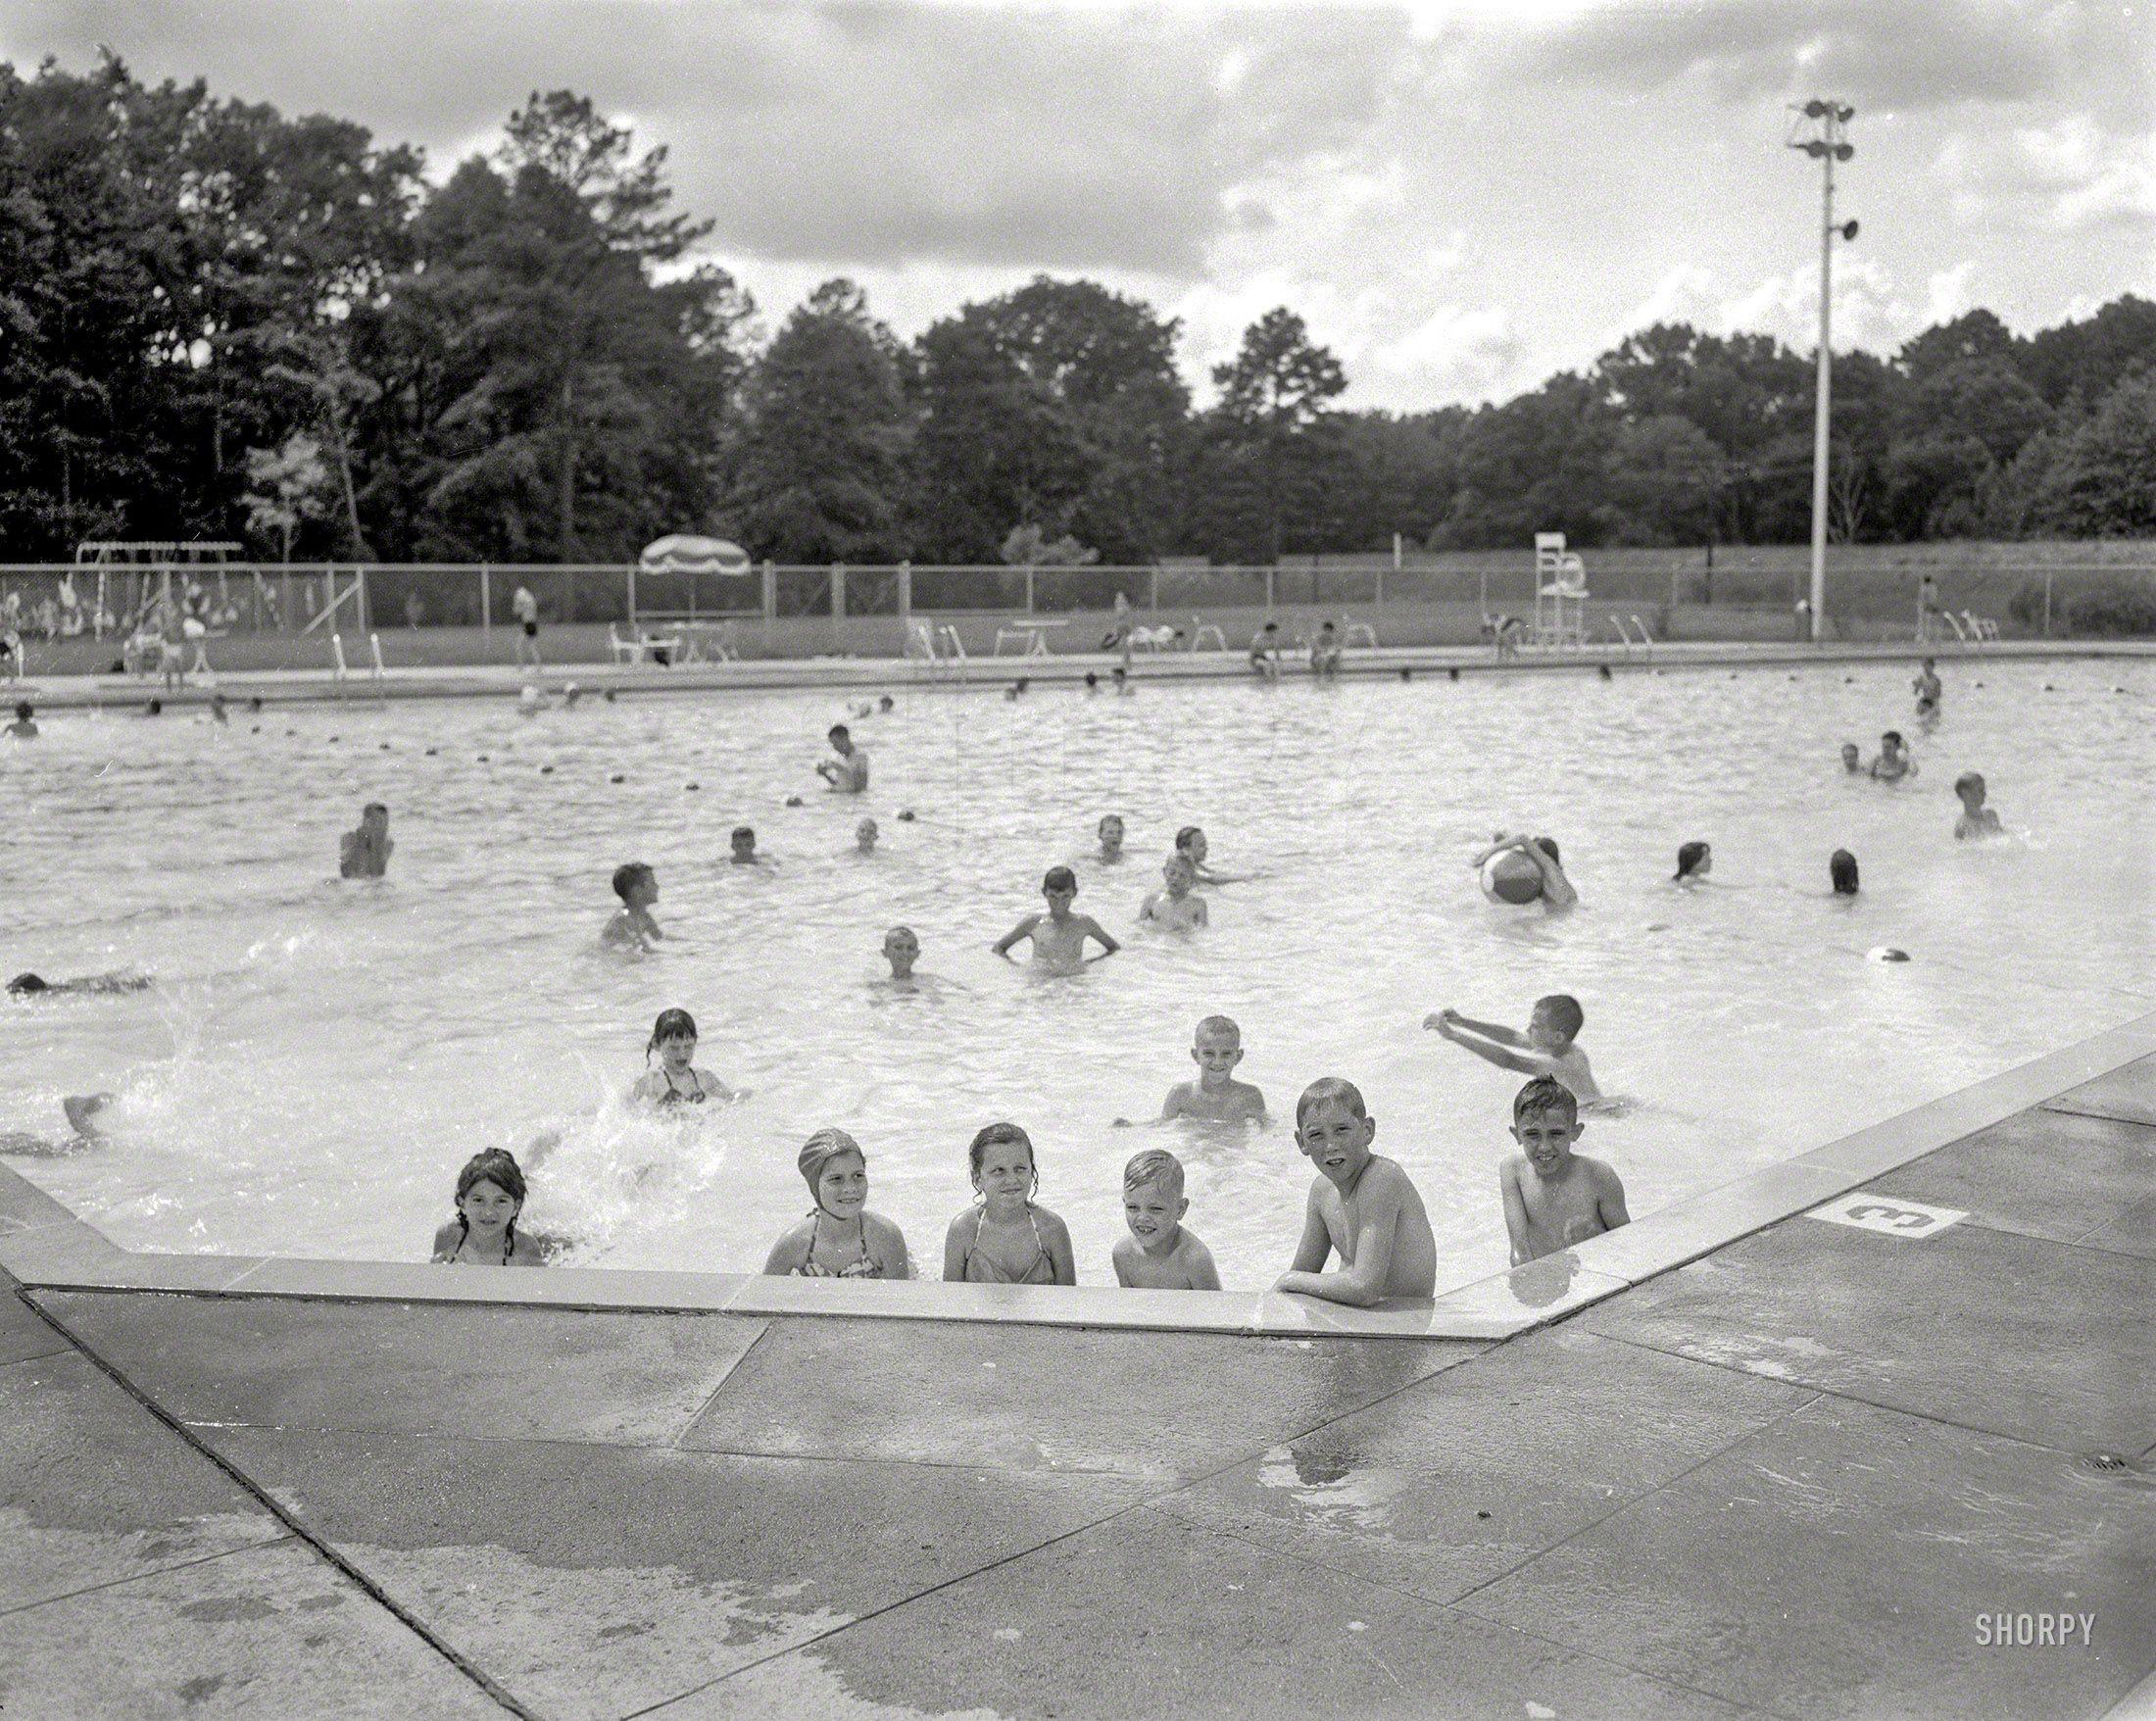 Public Pool Columbus Georgia Circa 1960 Municipal Pool 4x5 Negative Vintage Children